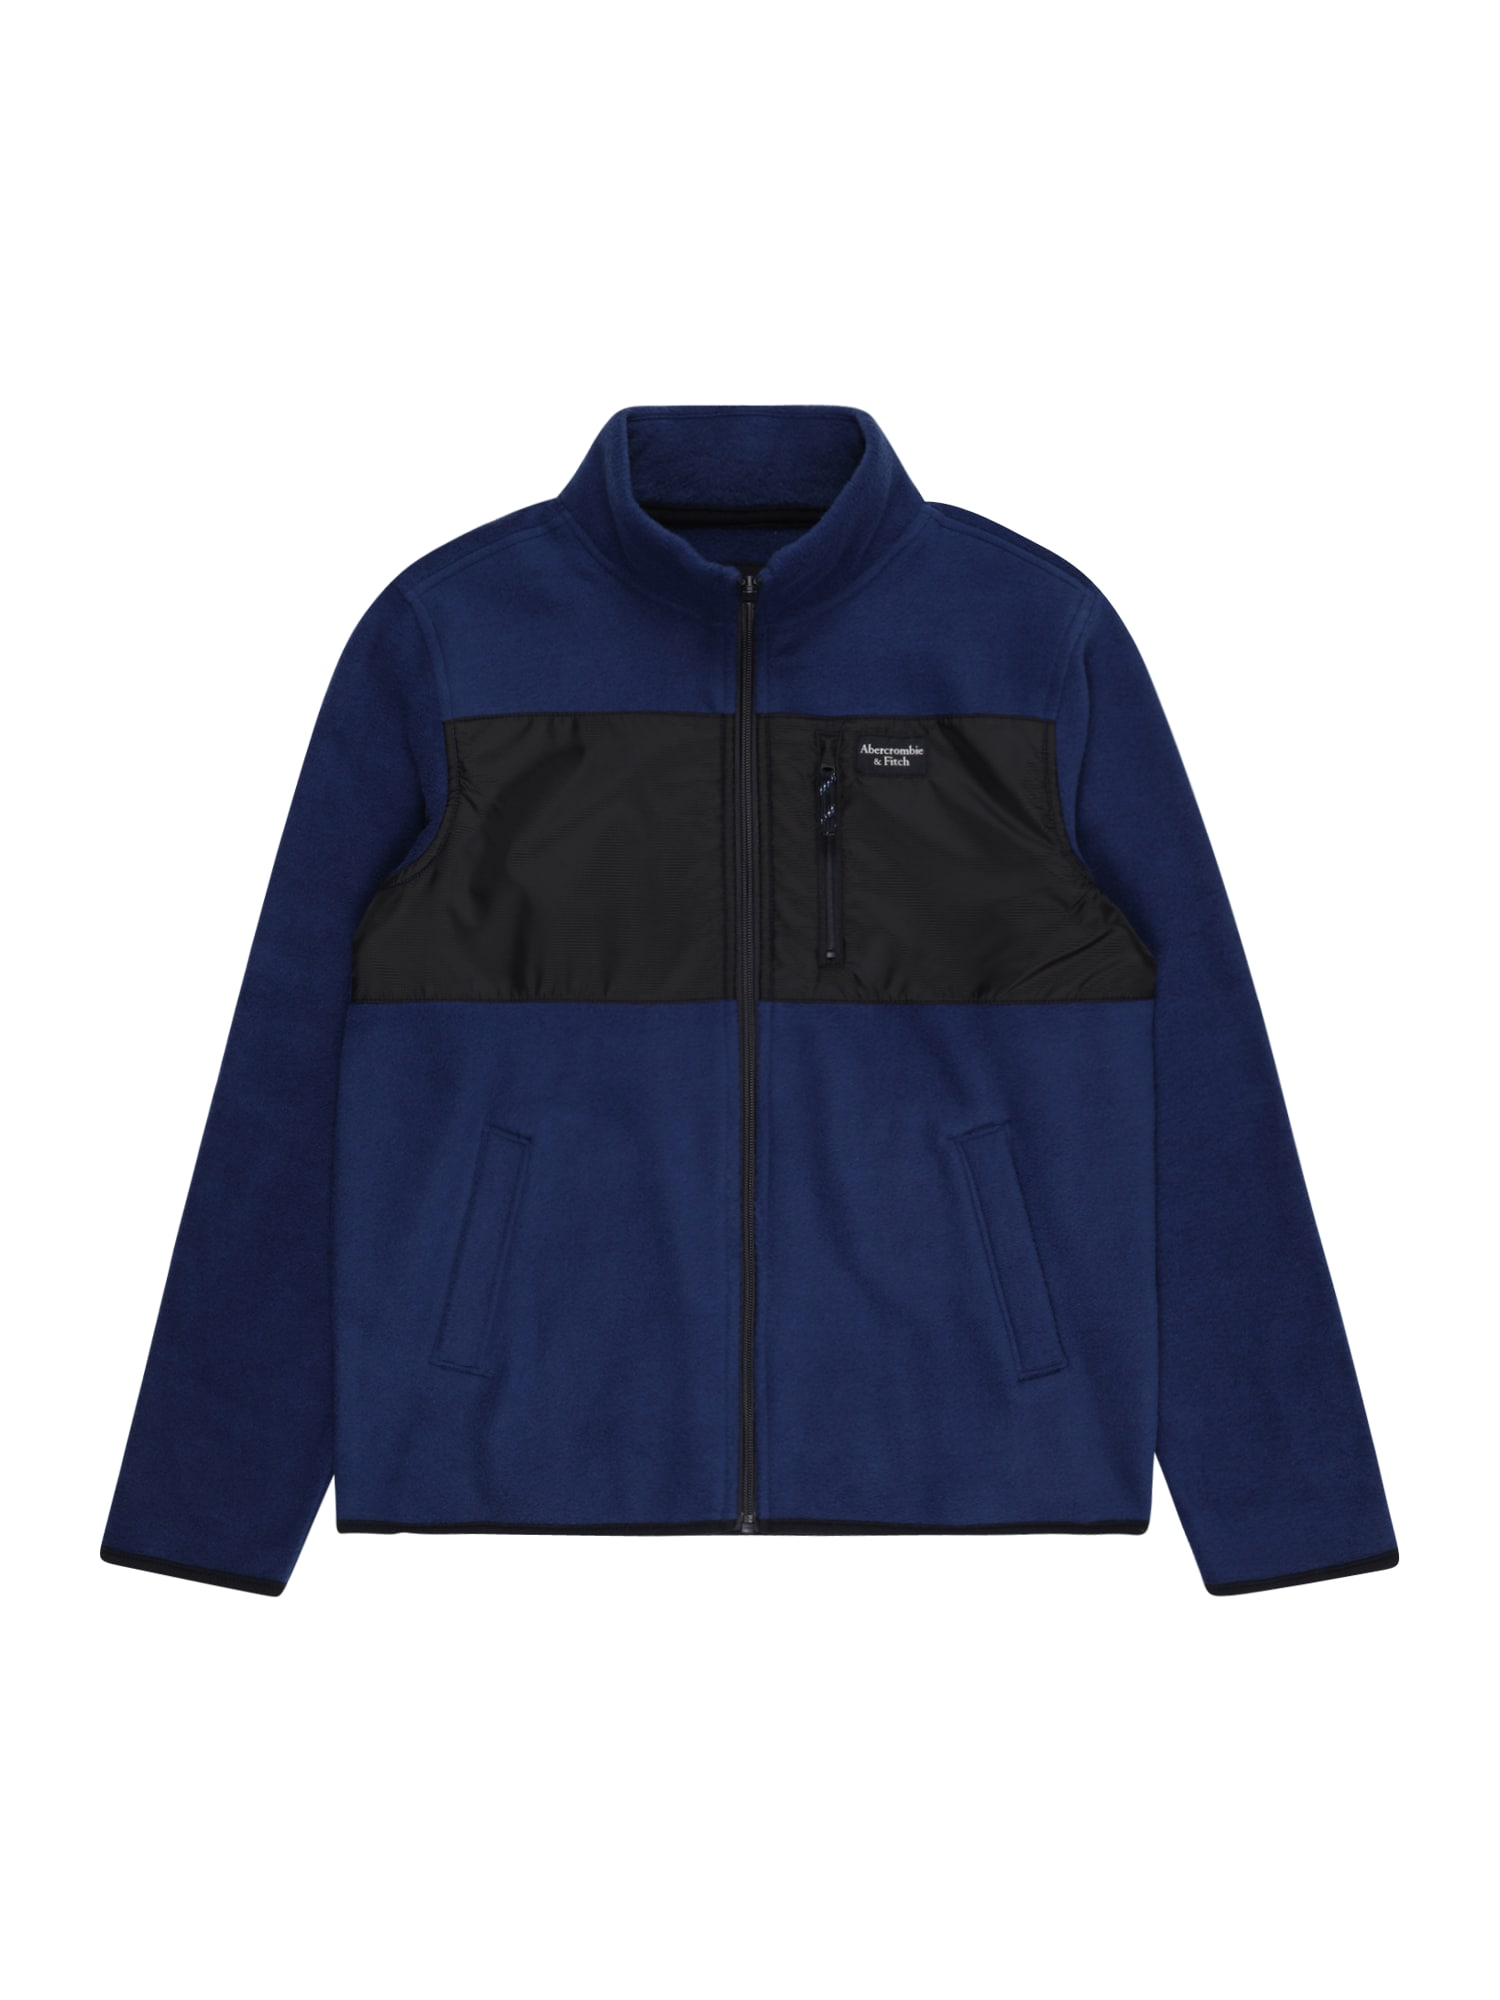 Abercrombie & Fitch Flisinis džemperis tamsiai mėlyna / juoda